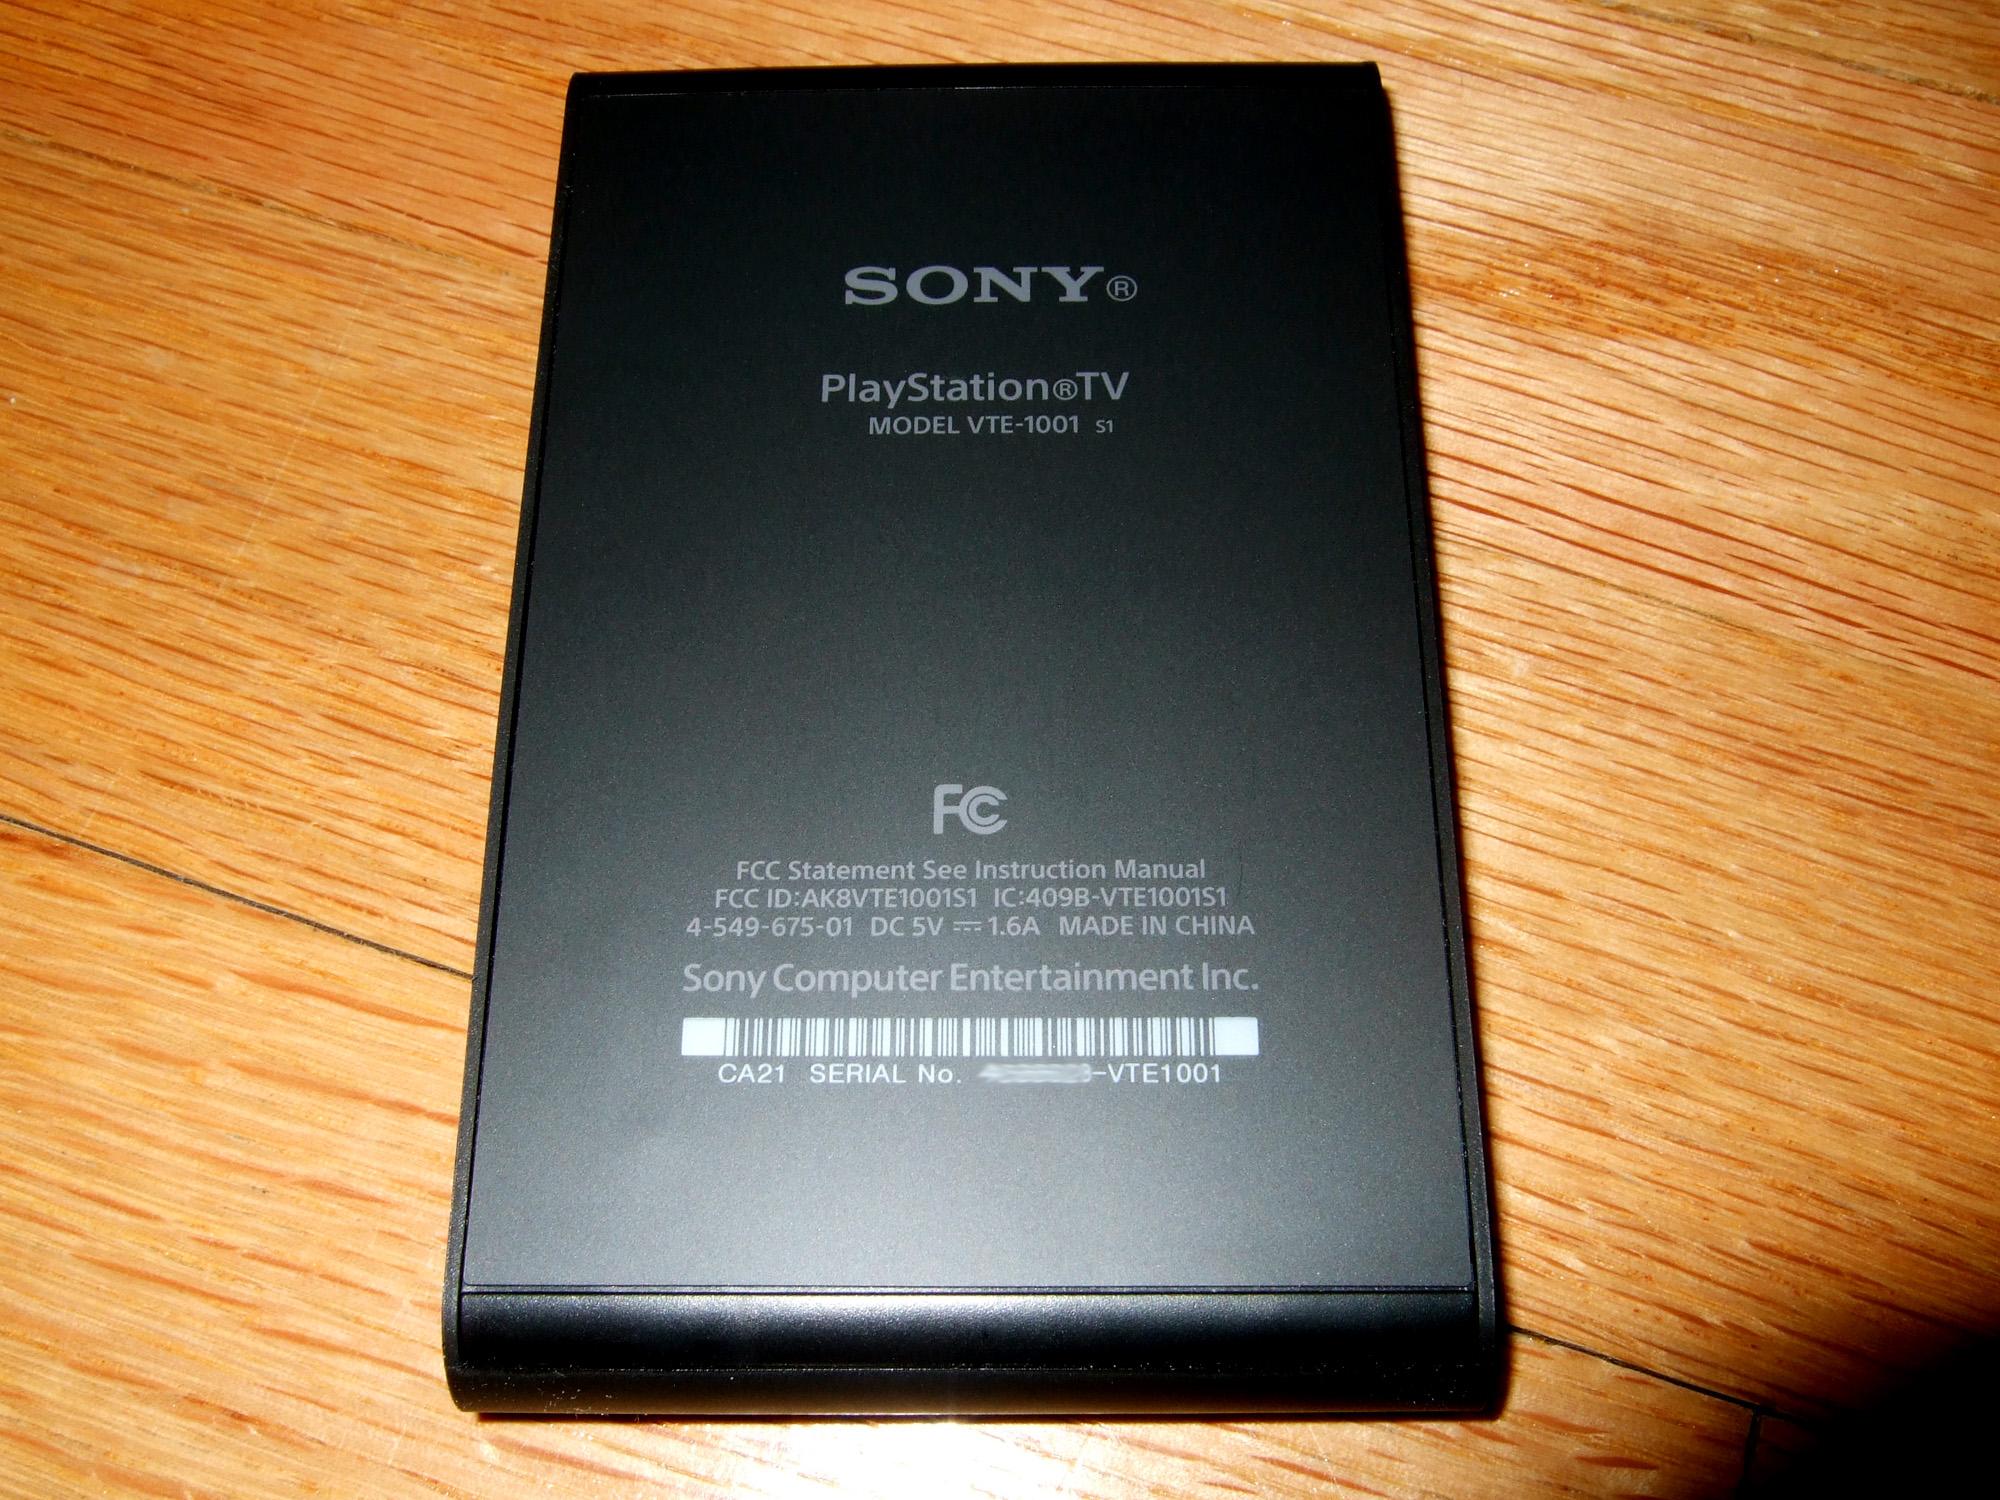 Playstation Vita Amp Playstation Tv Hardware Video Game